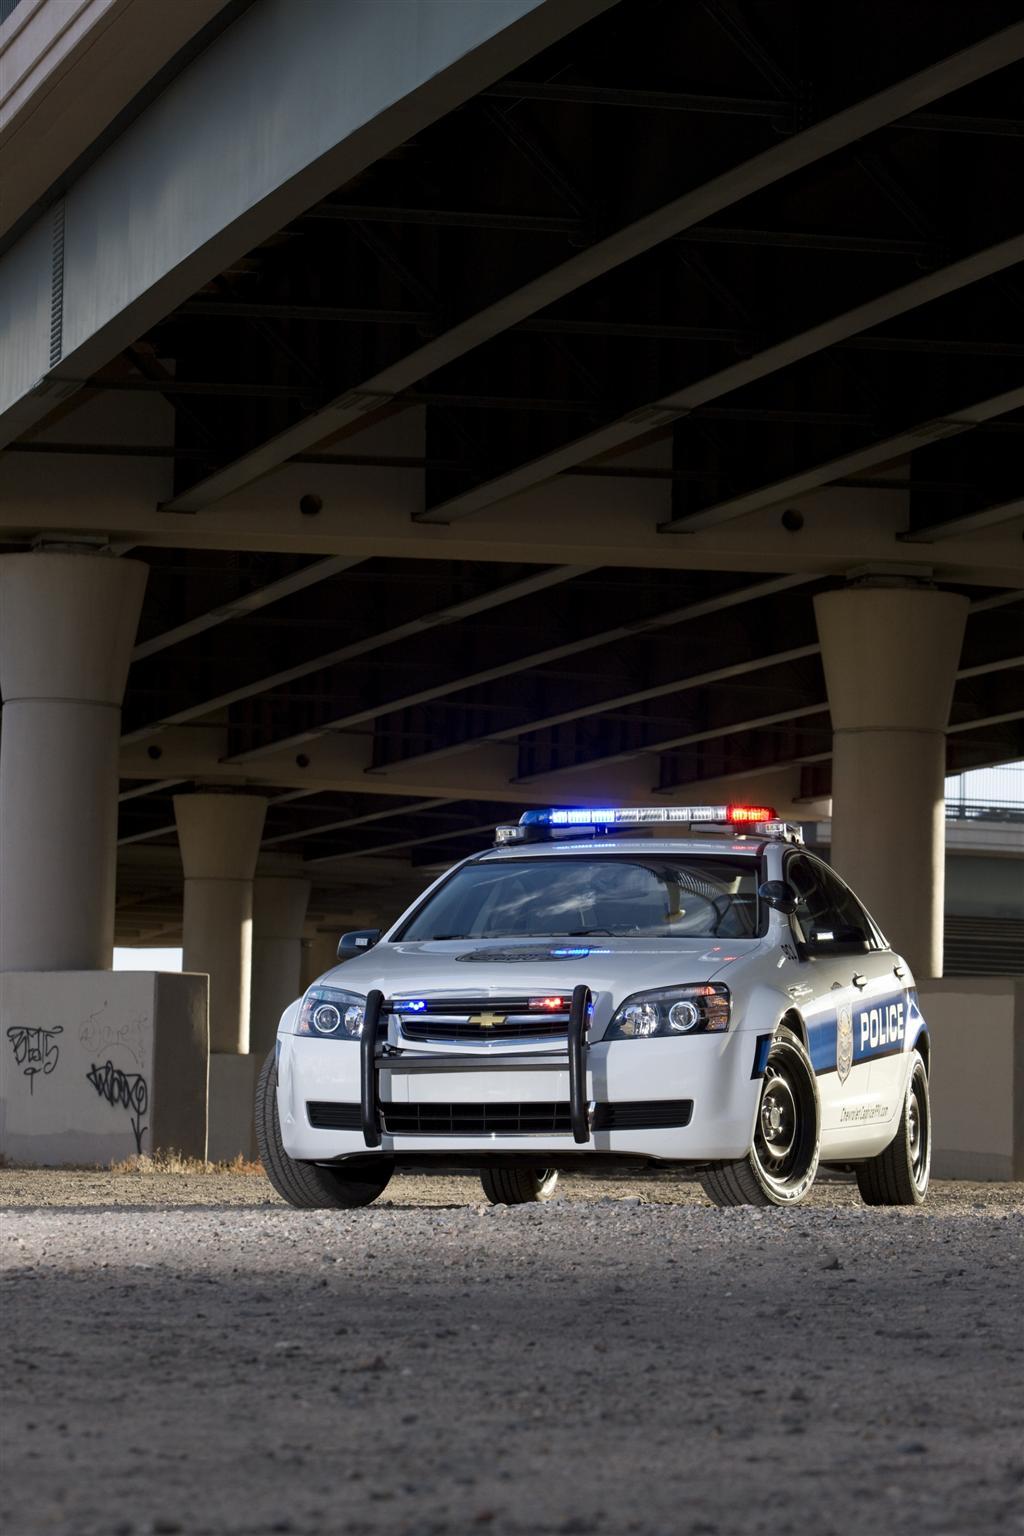 2011 Chevrolet Caprice Police Car Image. Photo 18 of 27